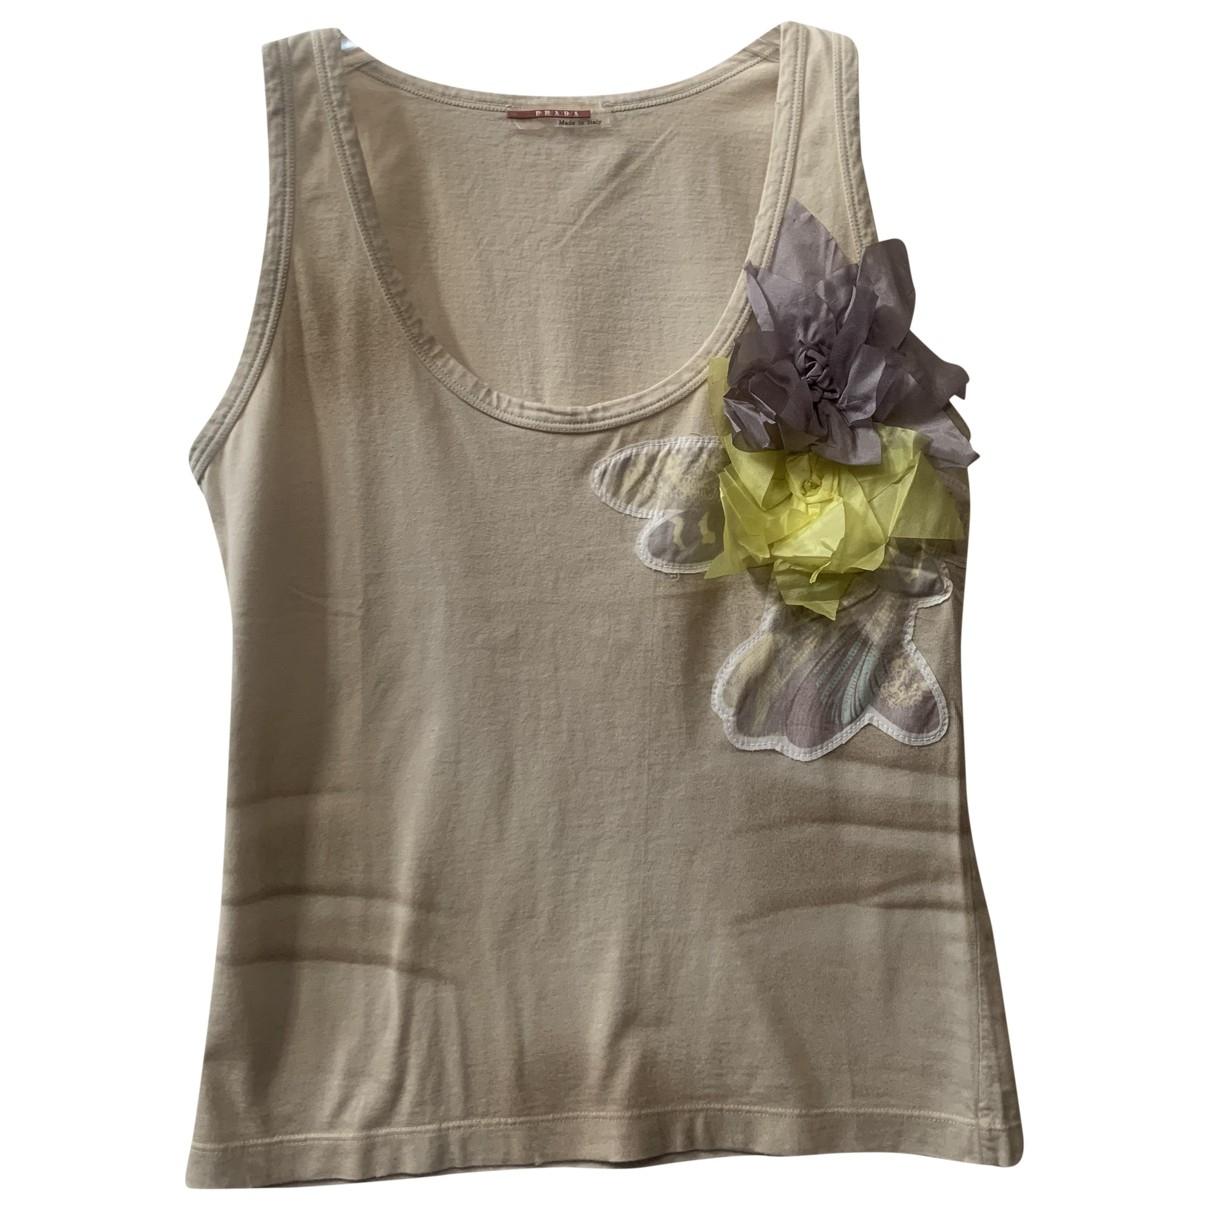 Camiseta sin mangas Prada